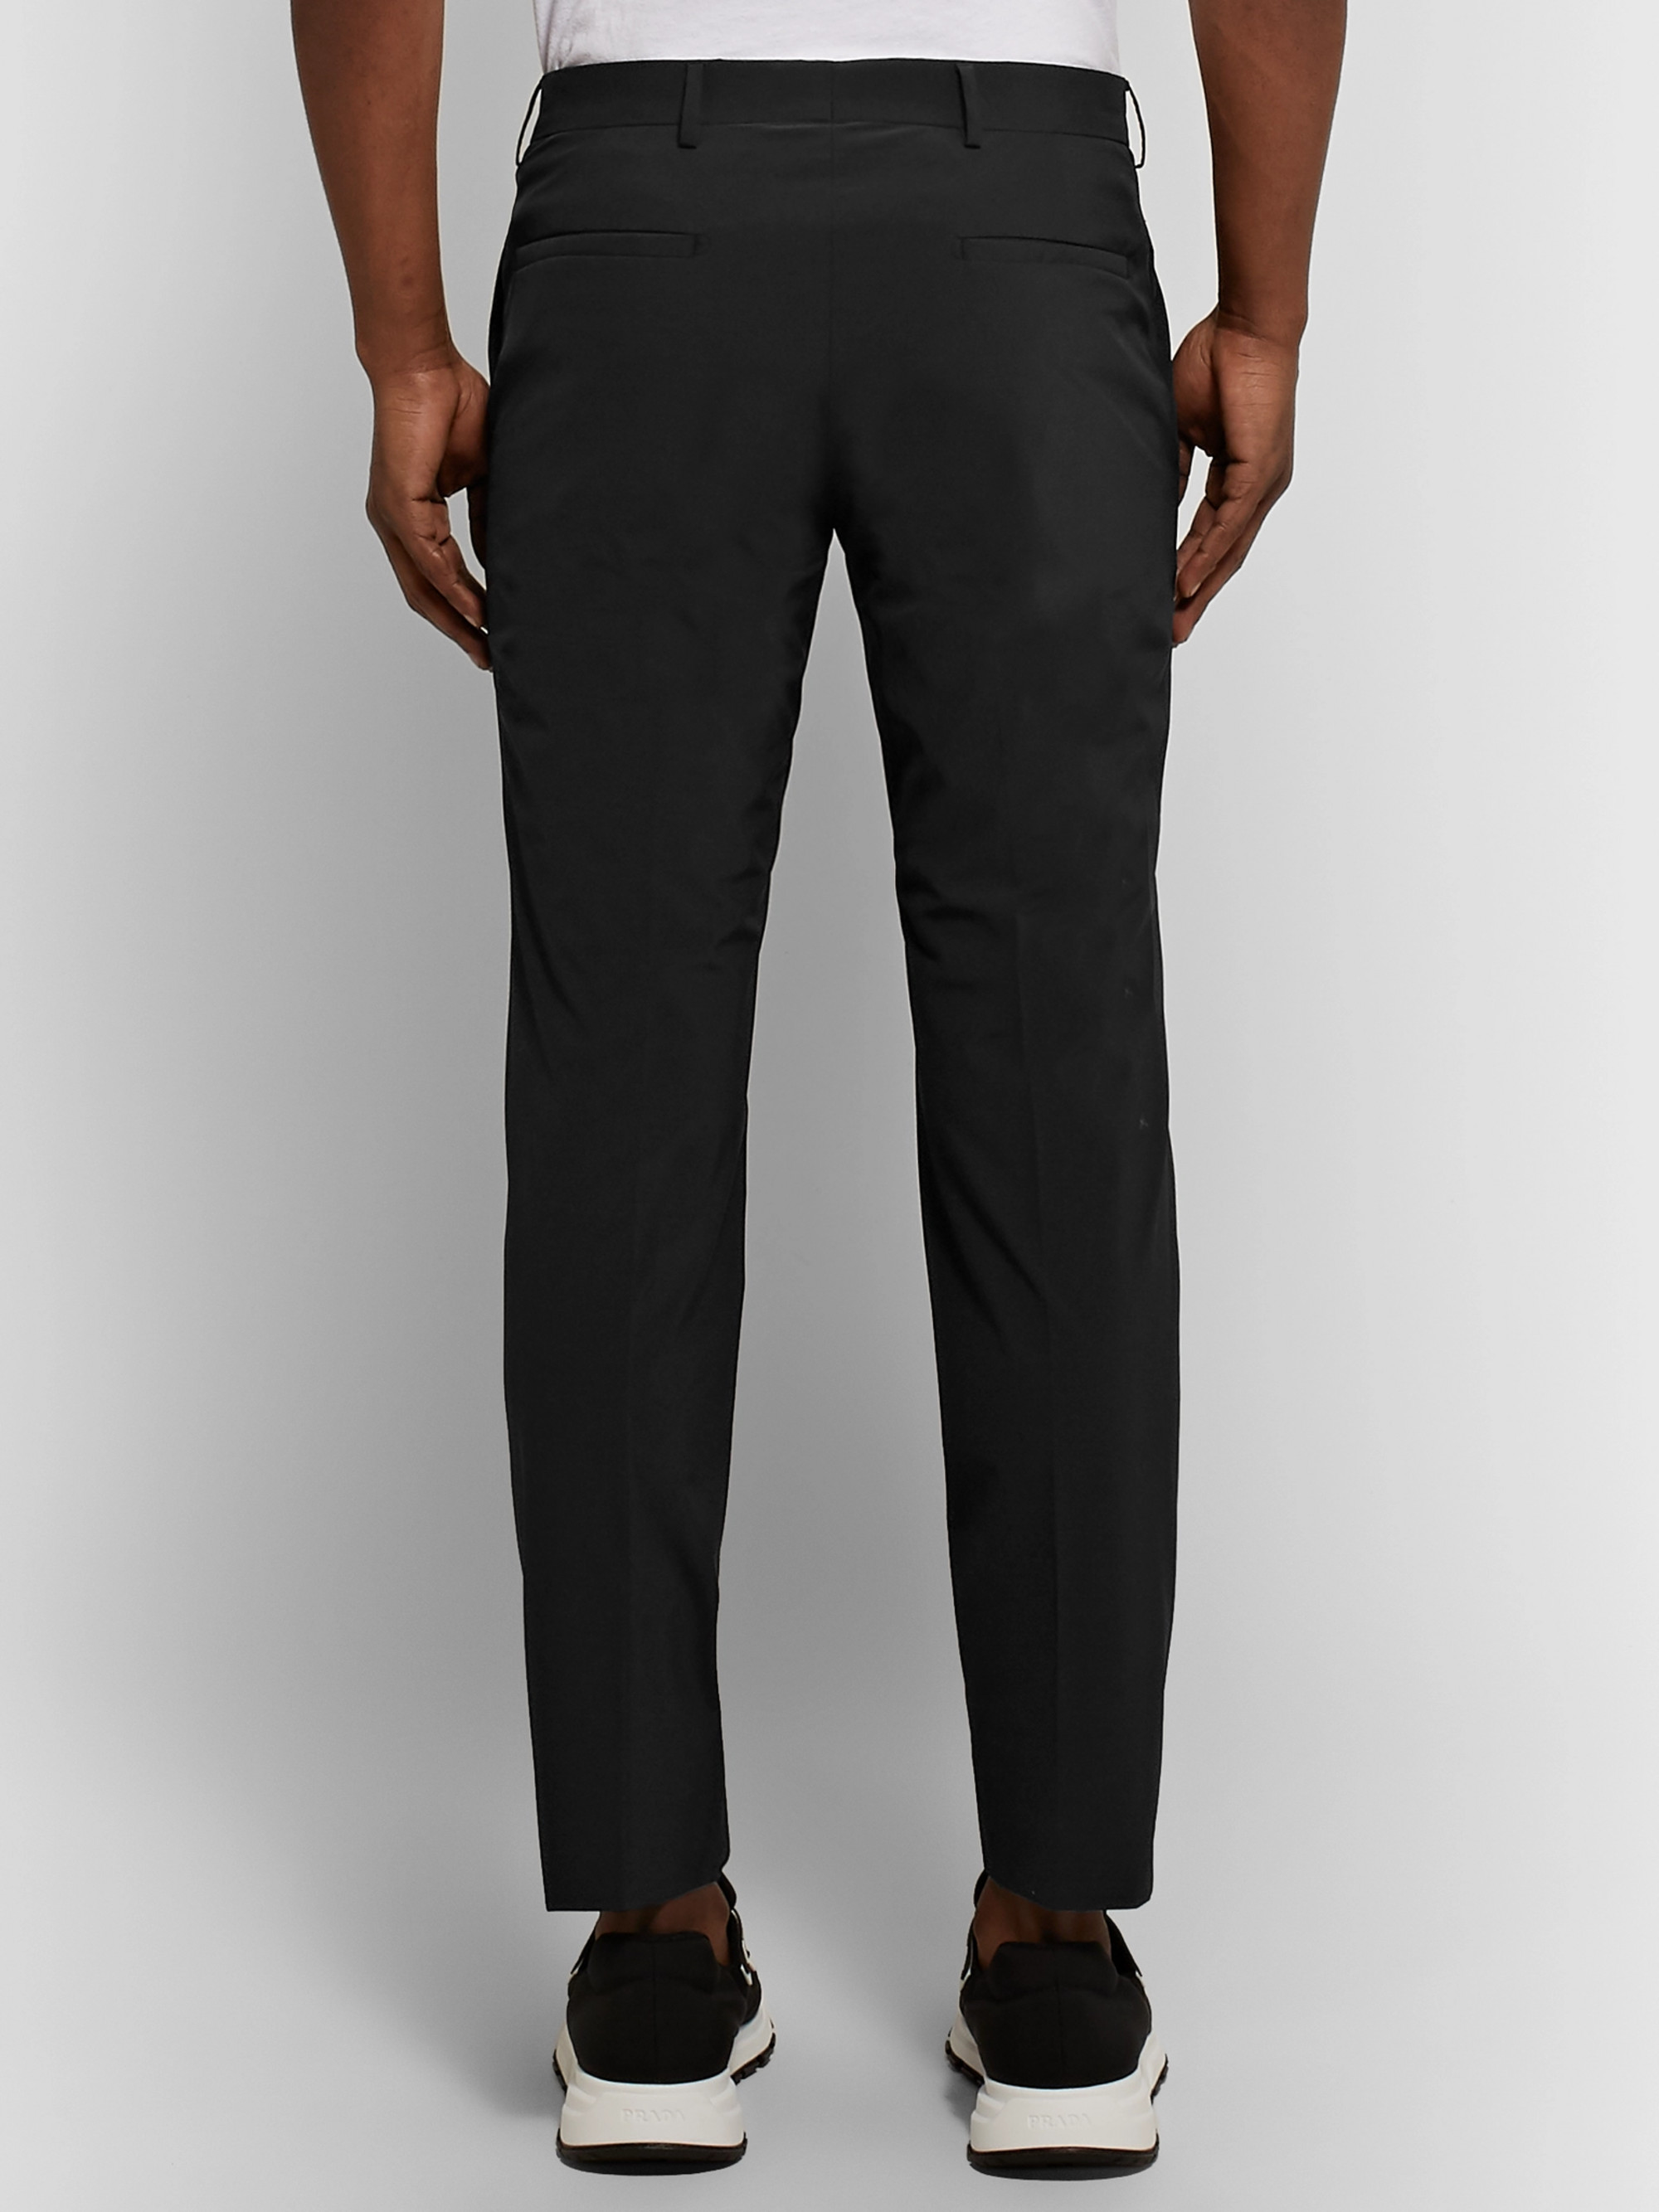 778350570a28 Black Black Slim-Fit Stretch-Shell Trousers | Prada | MR PORTER